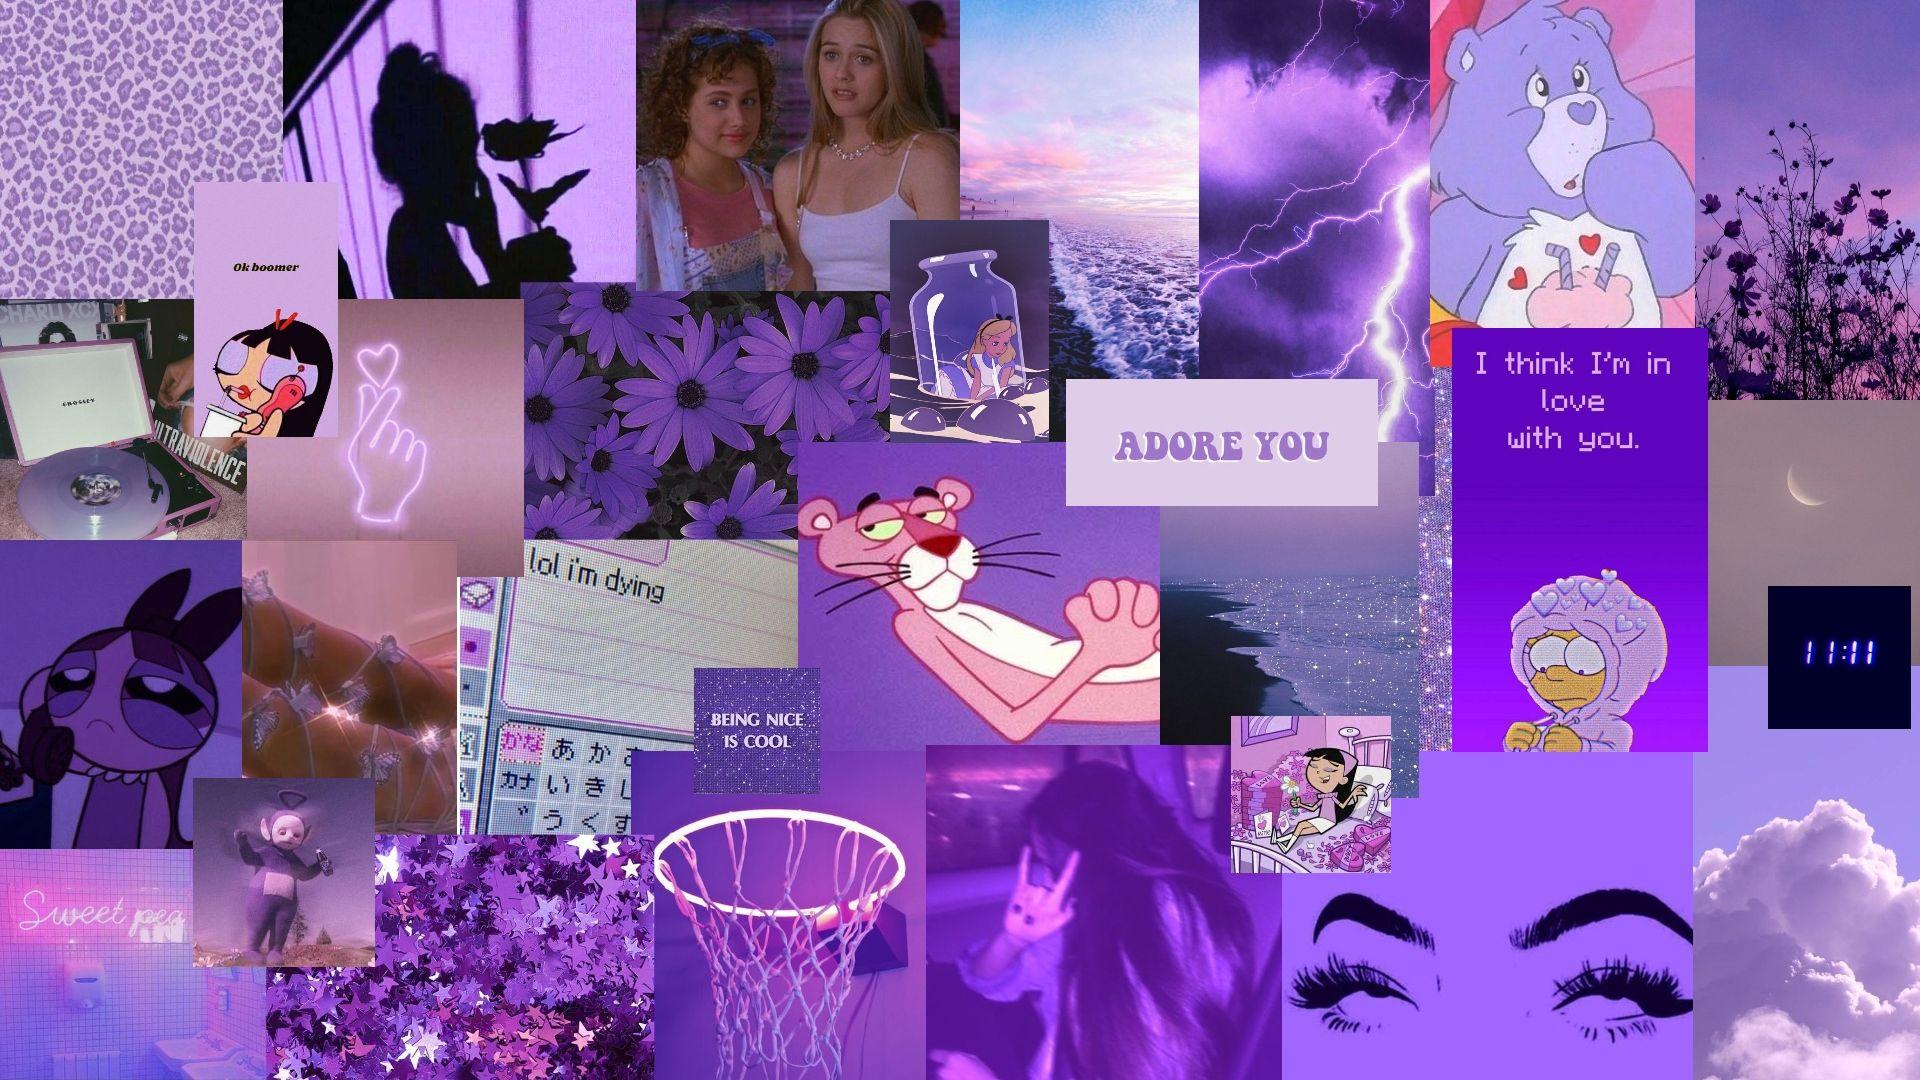 Purple Aesthetic Grunge Desktop Background In 2020 Aesthetic Desktop Wallpaper Harry Styles Wallpaper Desktop Wallpaper Art